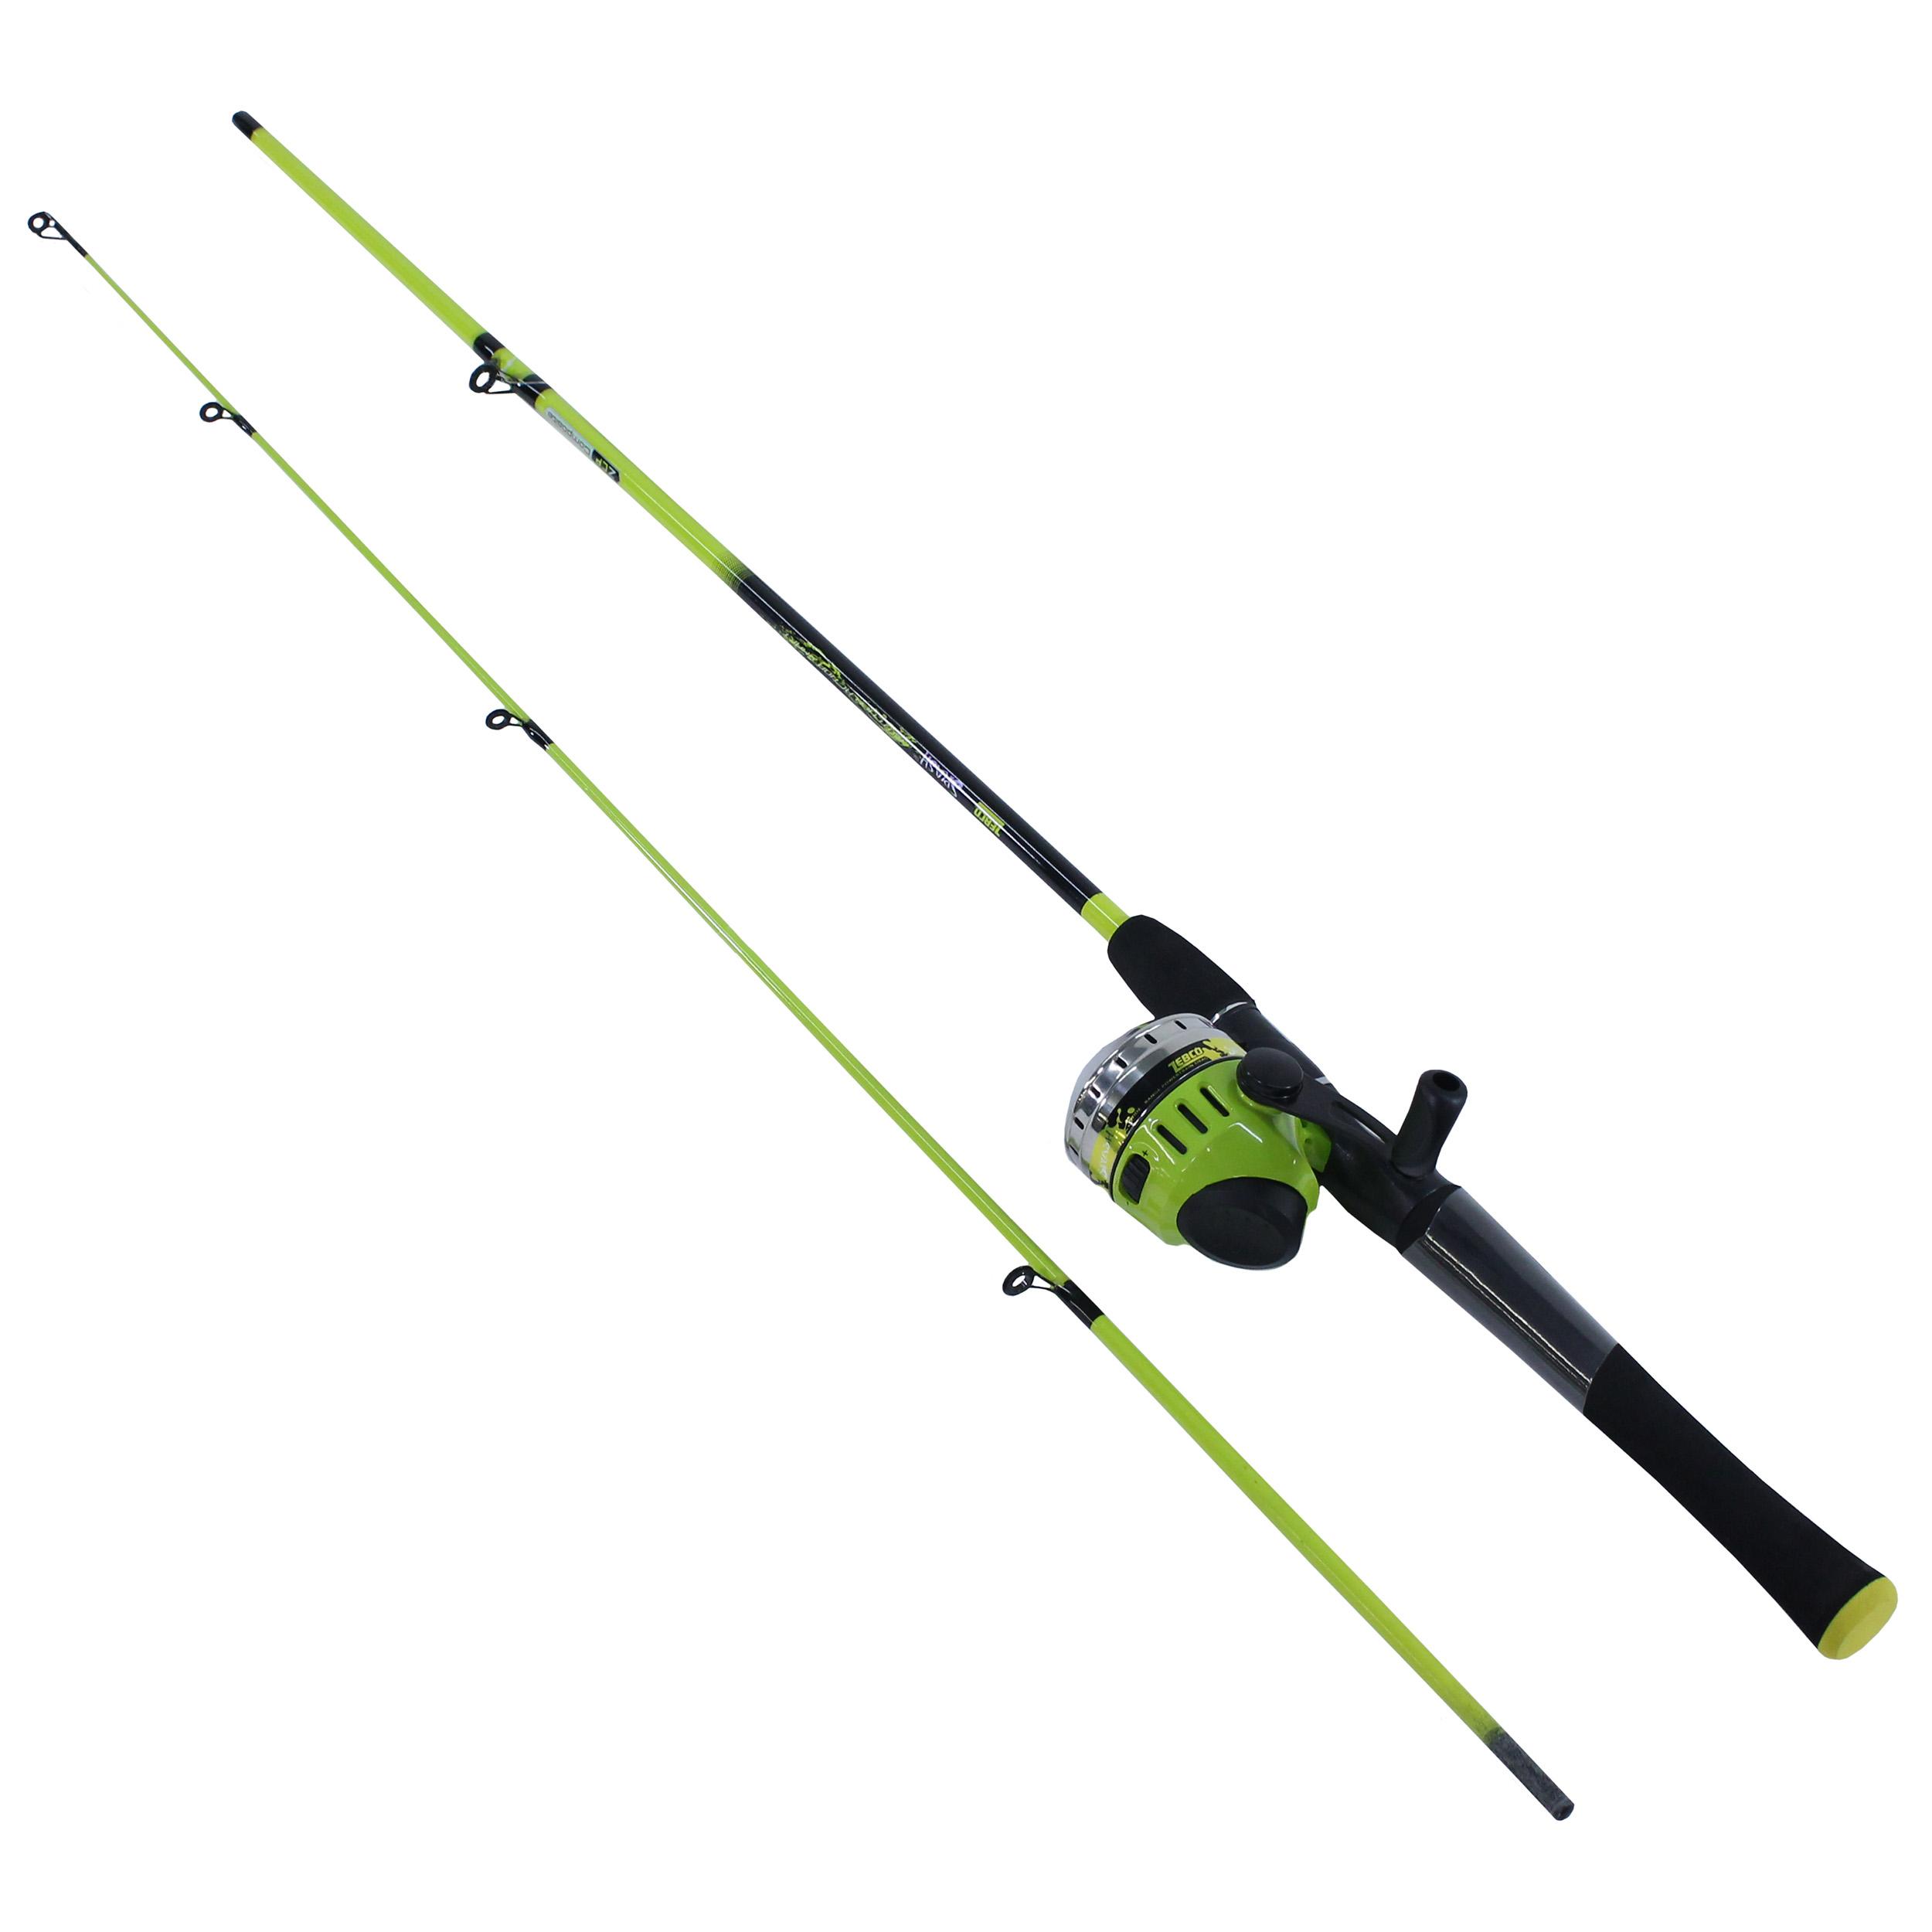 Zebco Splash 6 Ft 2-Piece Rod /& Reel Combo Fishing Pole